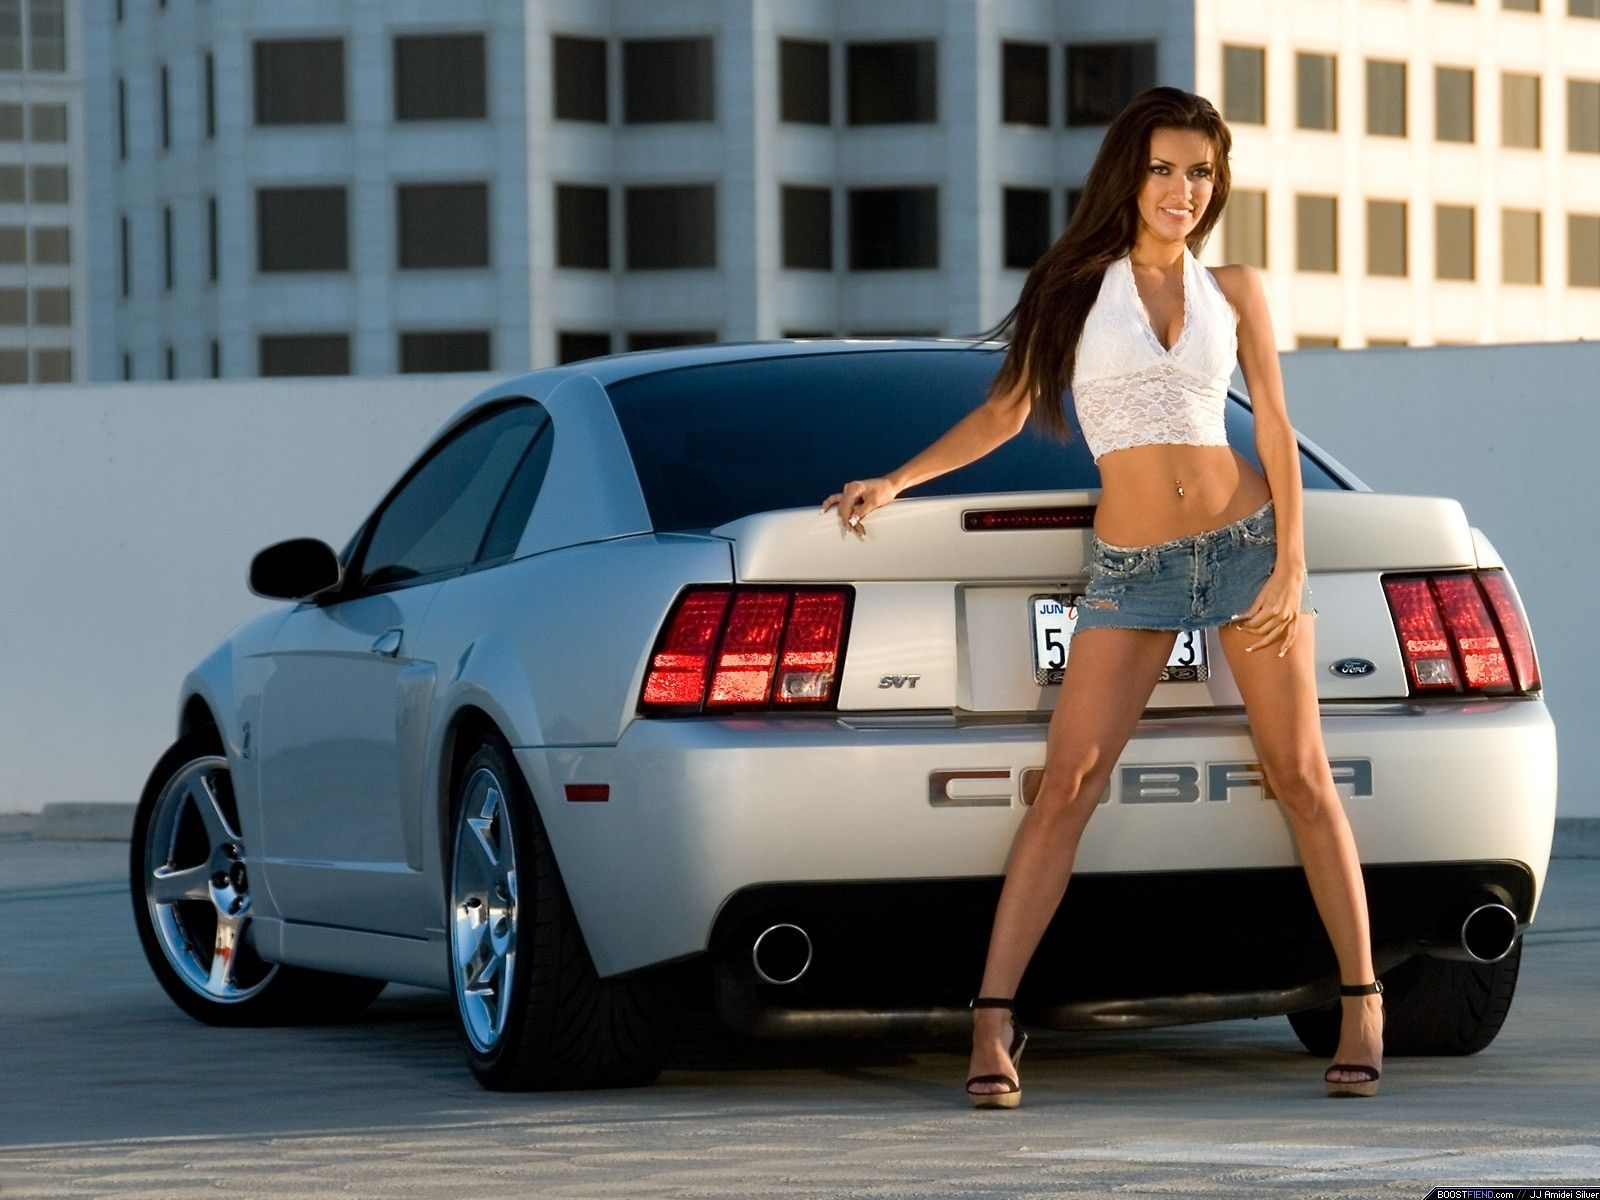 Ford Mustang Svt Cobra Mustang Girl Ford Mustang Cobra Ford Mustang